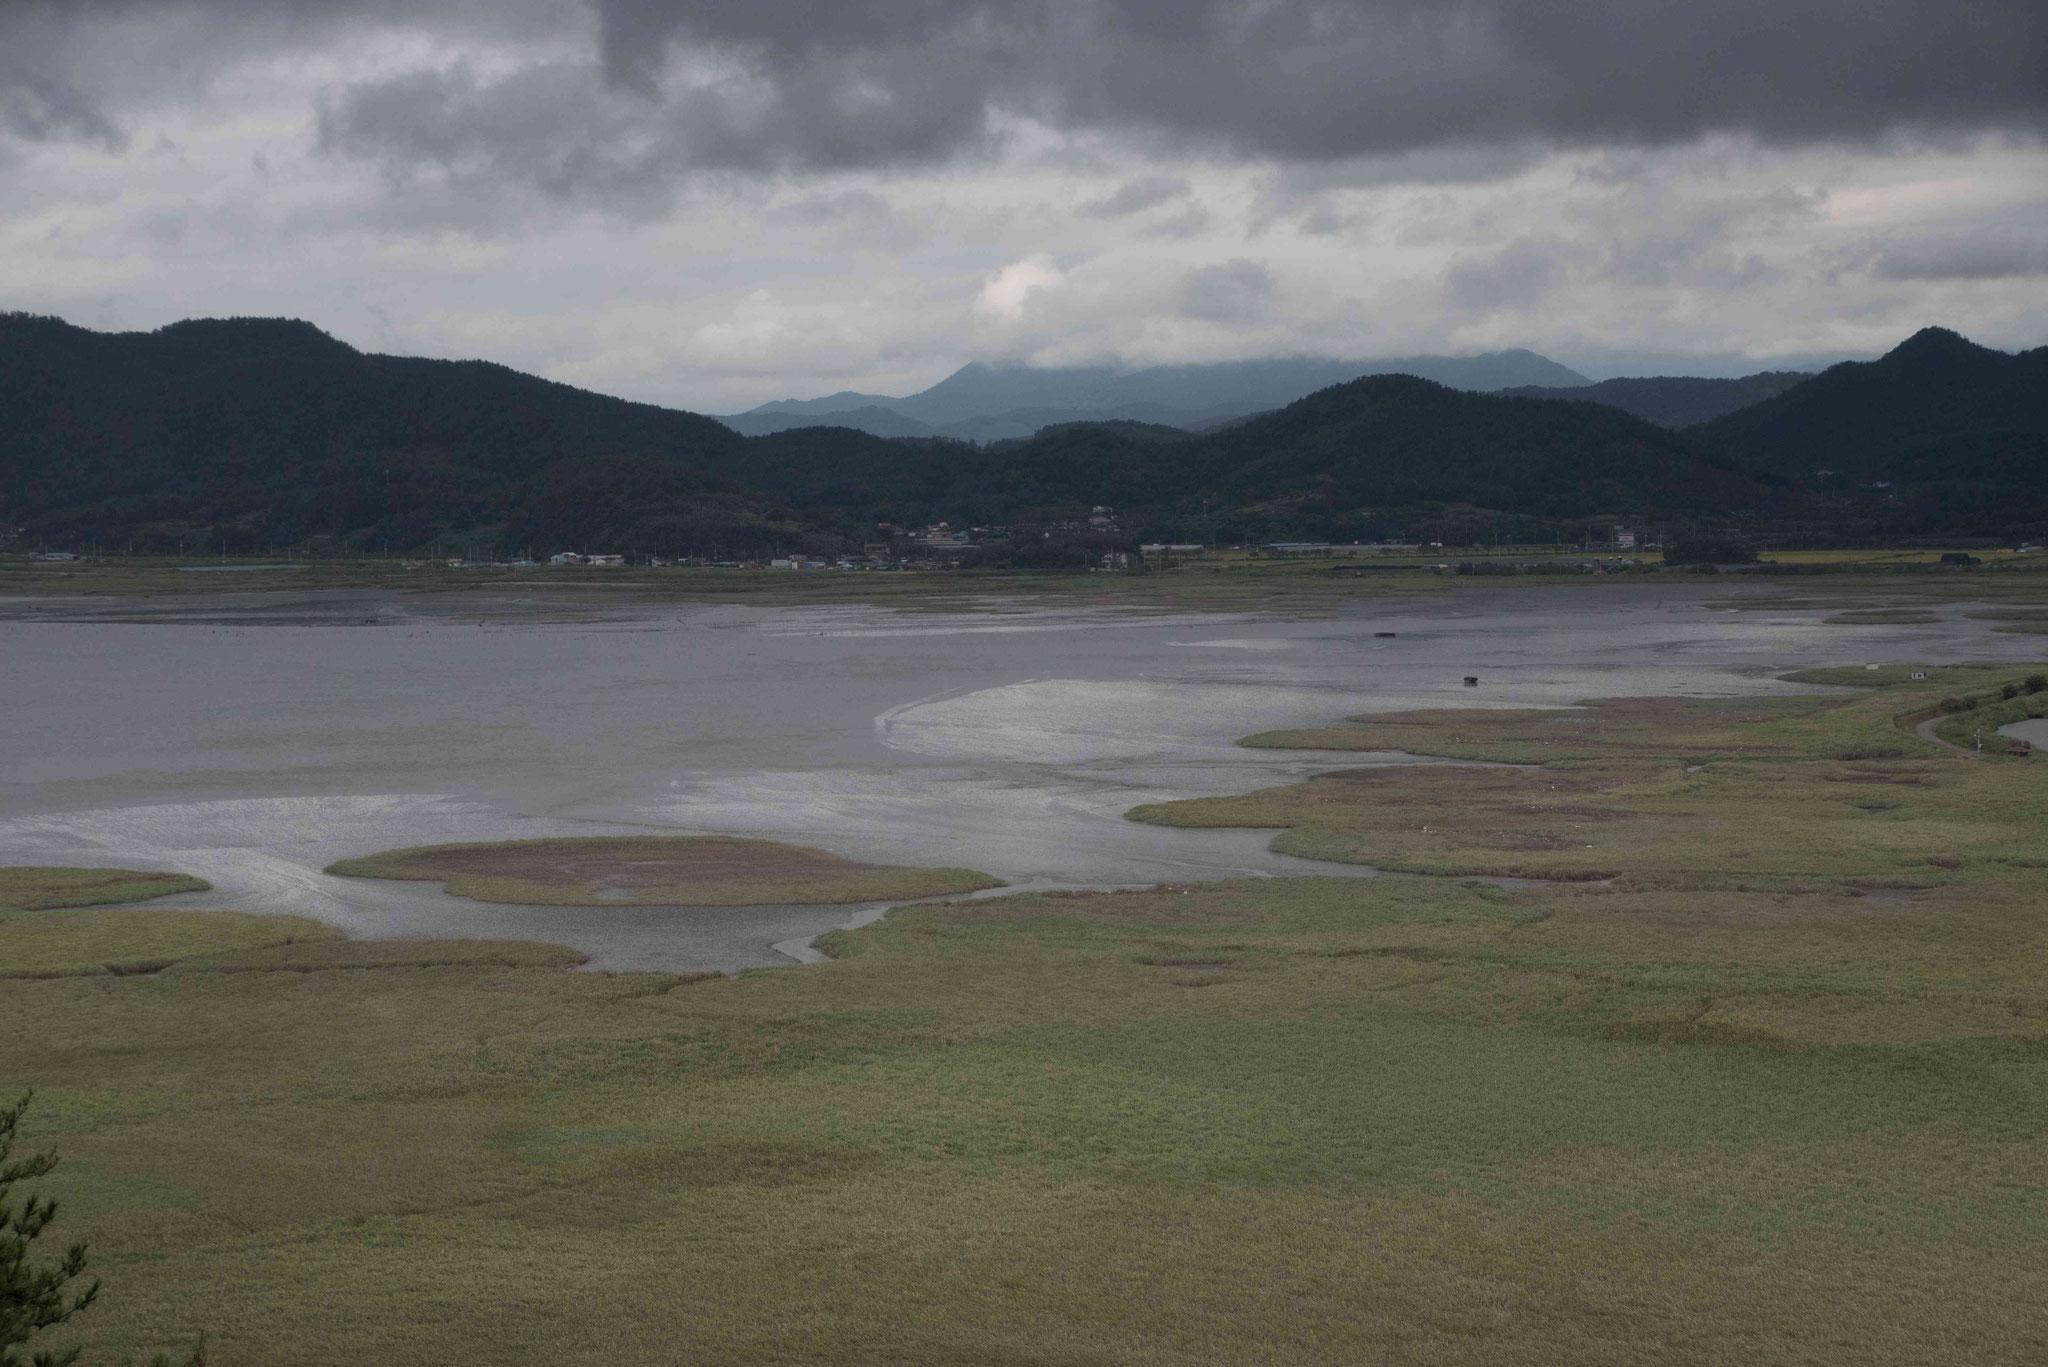 Blick ins Landesinnere nach Suncheon